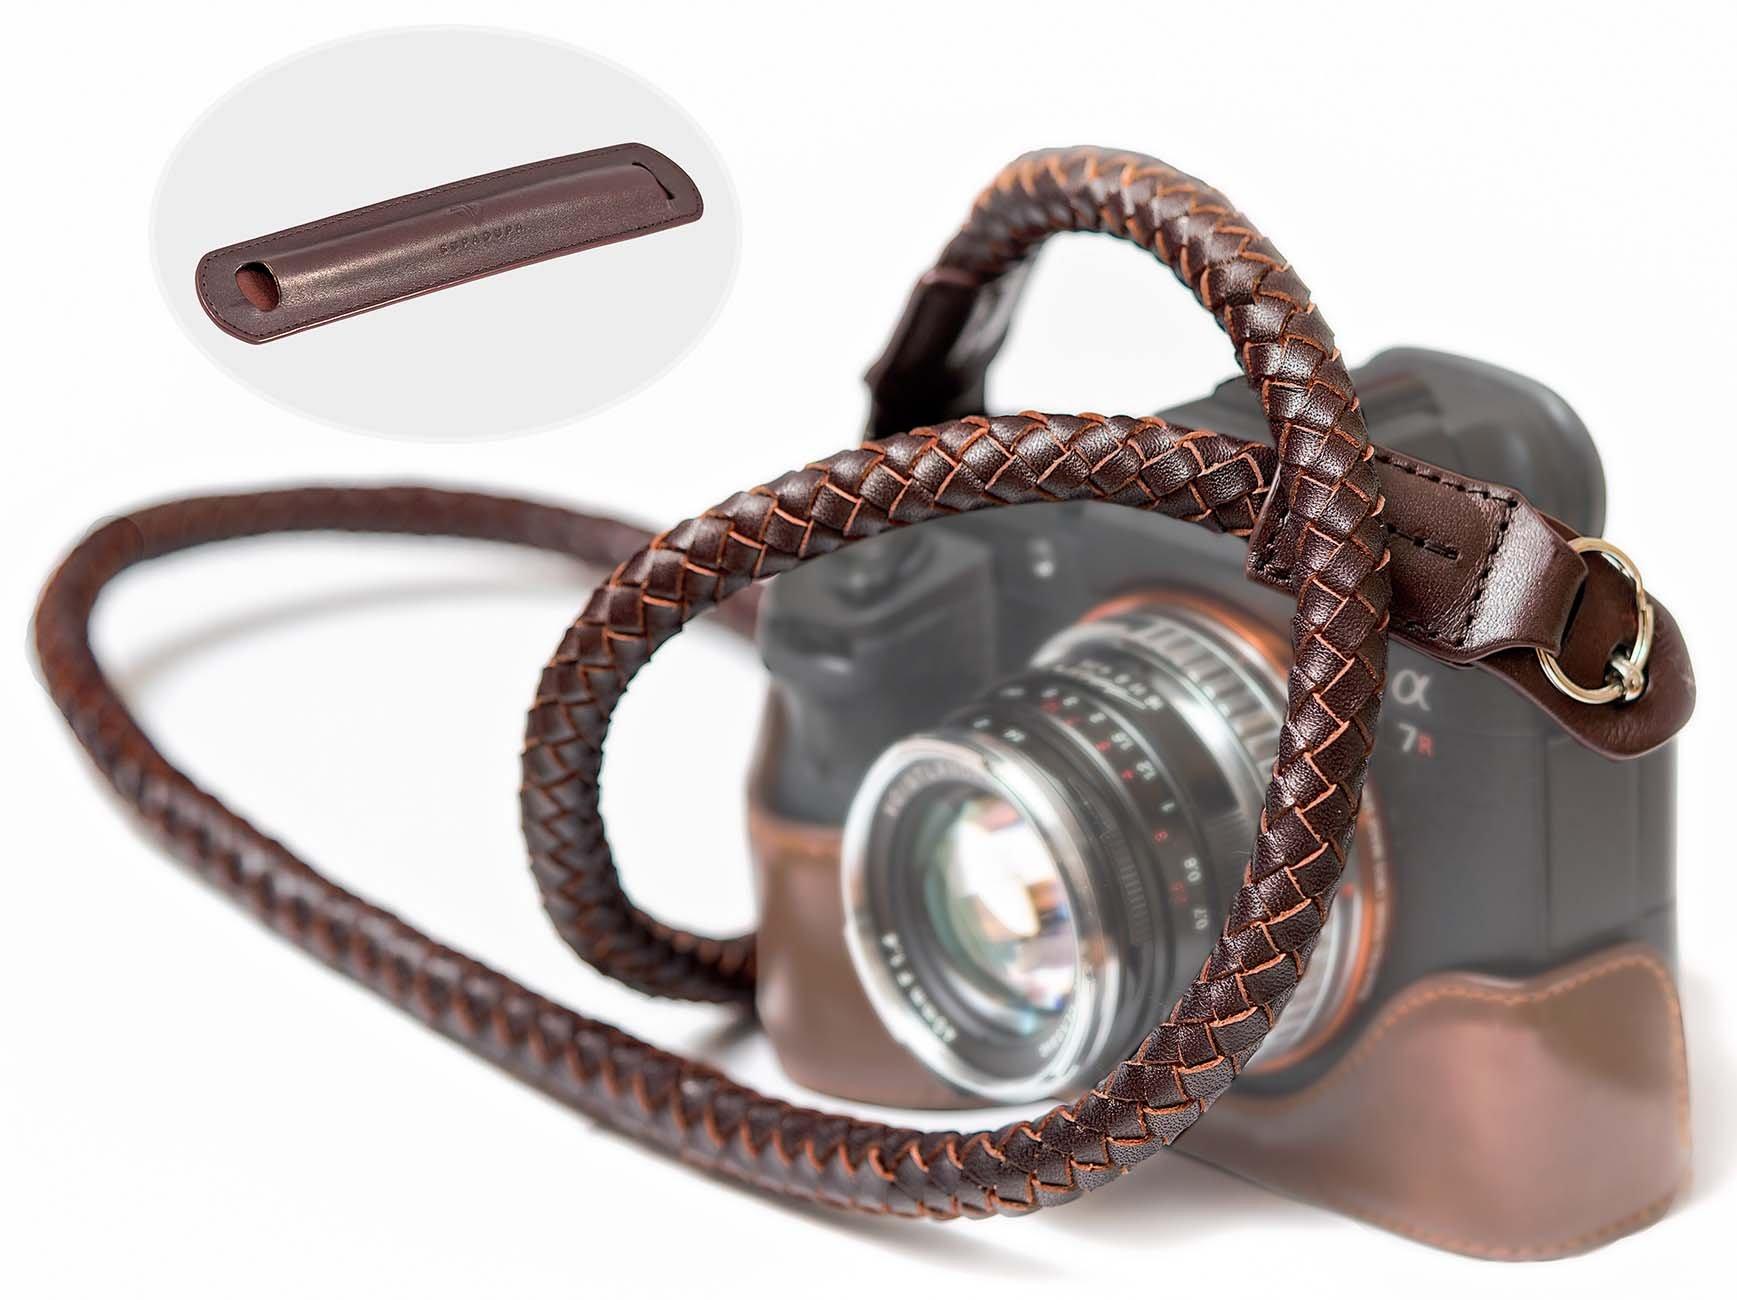 SupaDupa Leather Braided Camera Strap - Premium Quality - Men Women Neck Shoulder Sling Wrist For Sony Leica Fujifilm Canon Olympus Panasonic Nikon Pentax Binoculars Mirrorless + FREE Pad by SupaDupa Photo